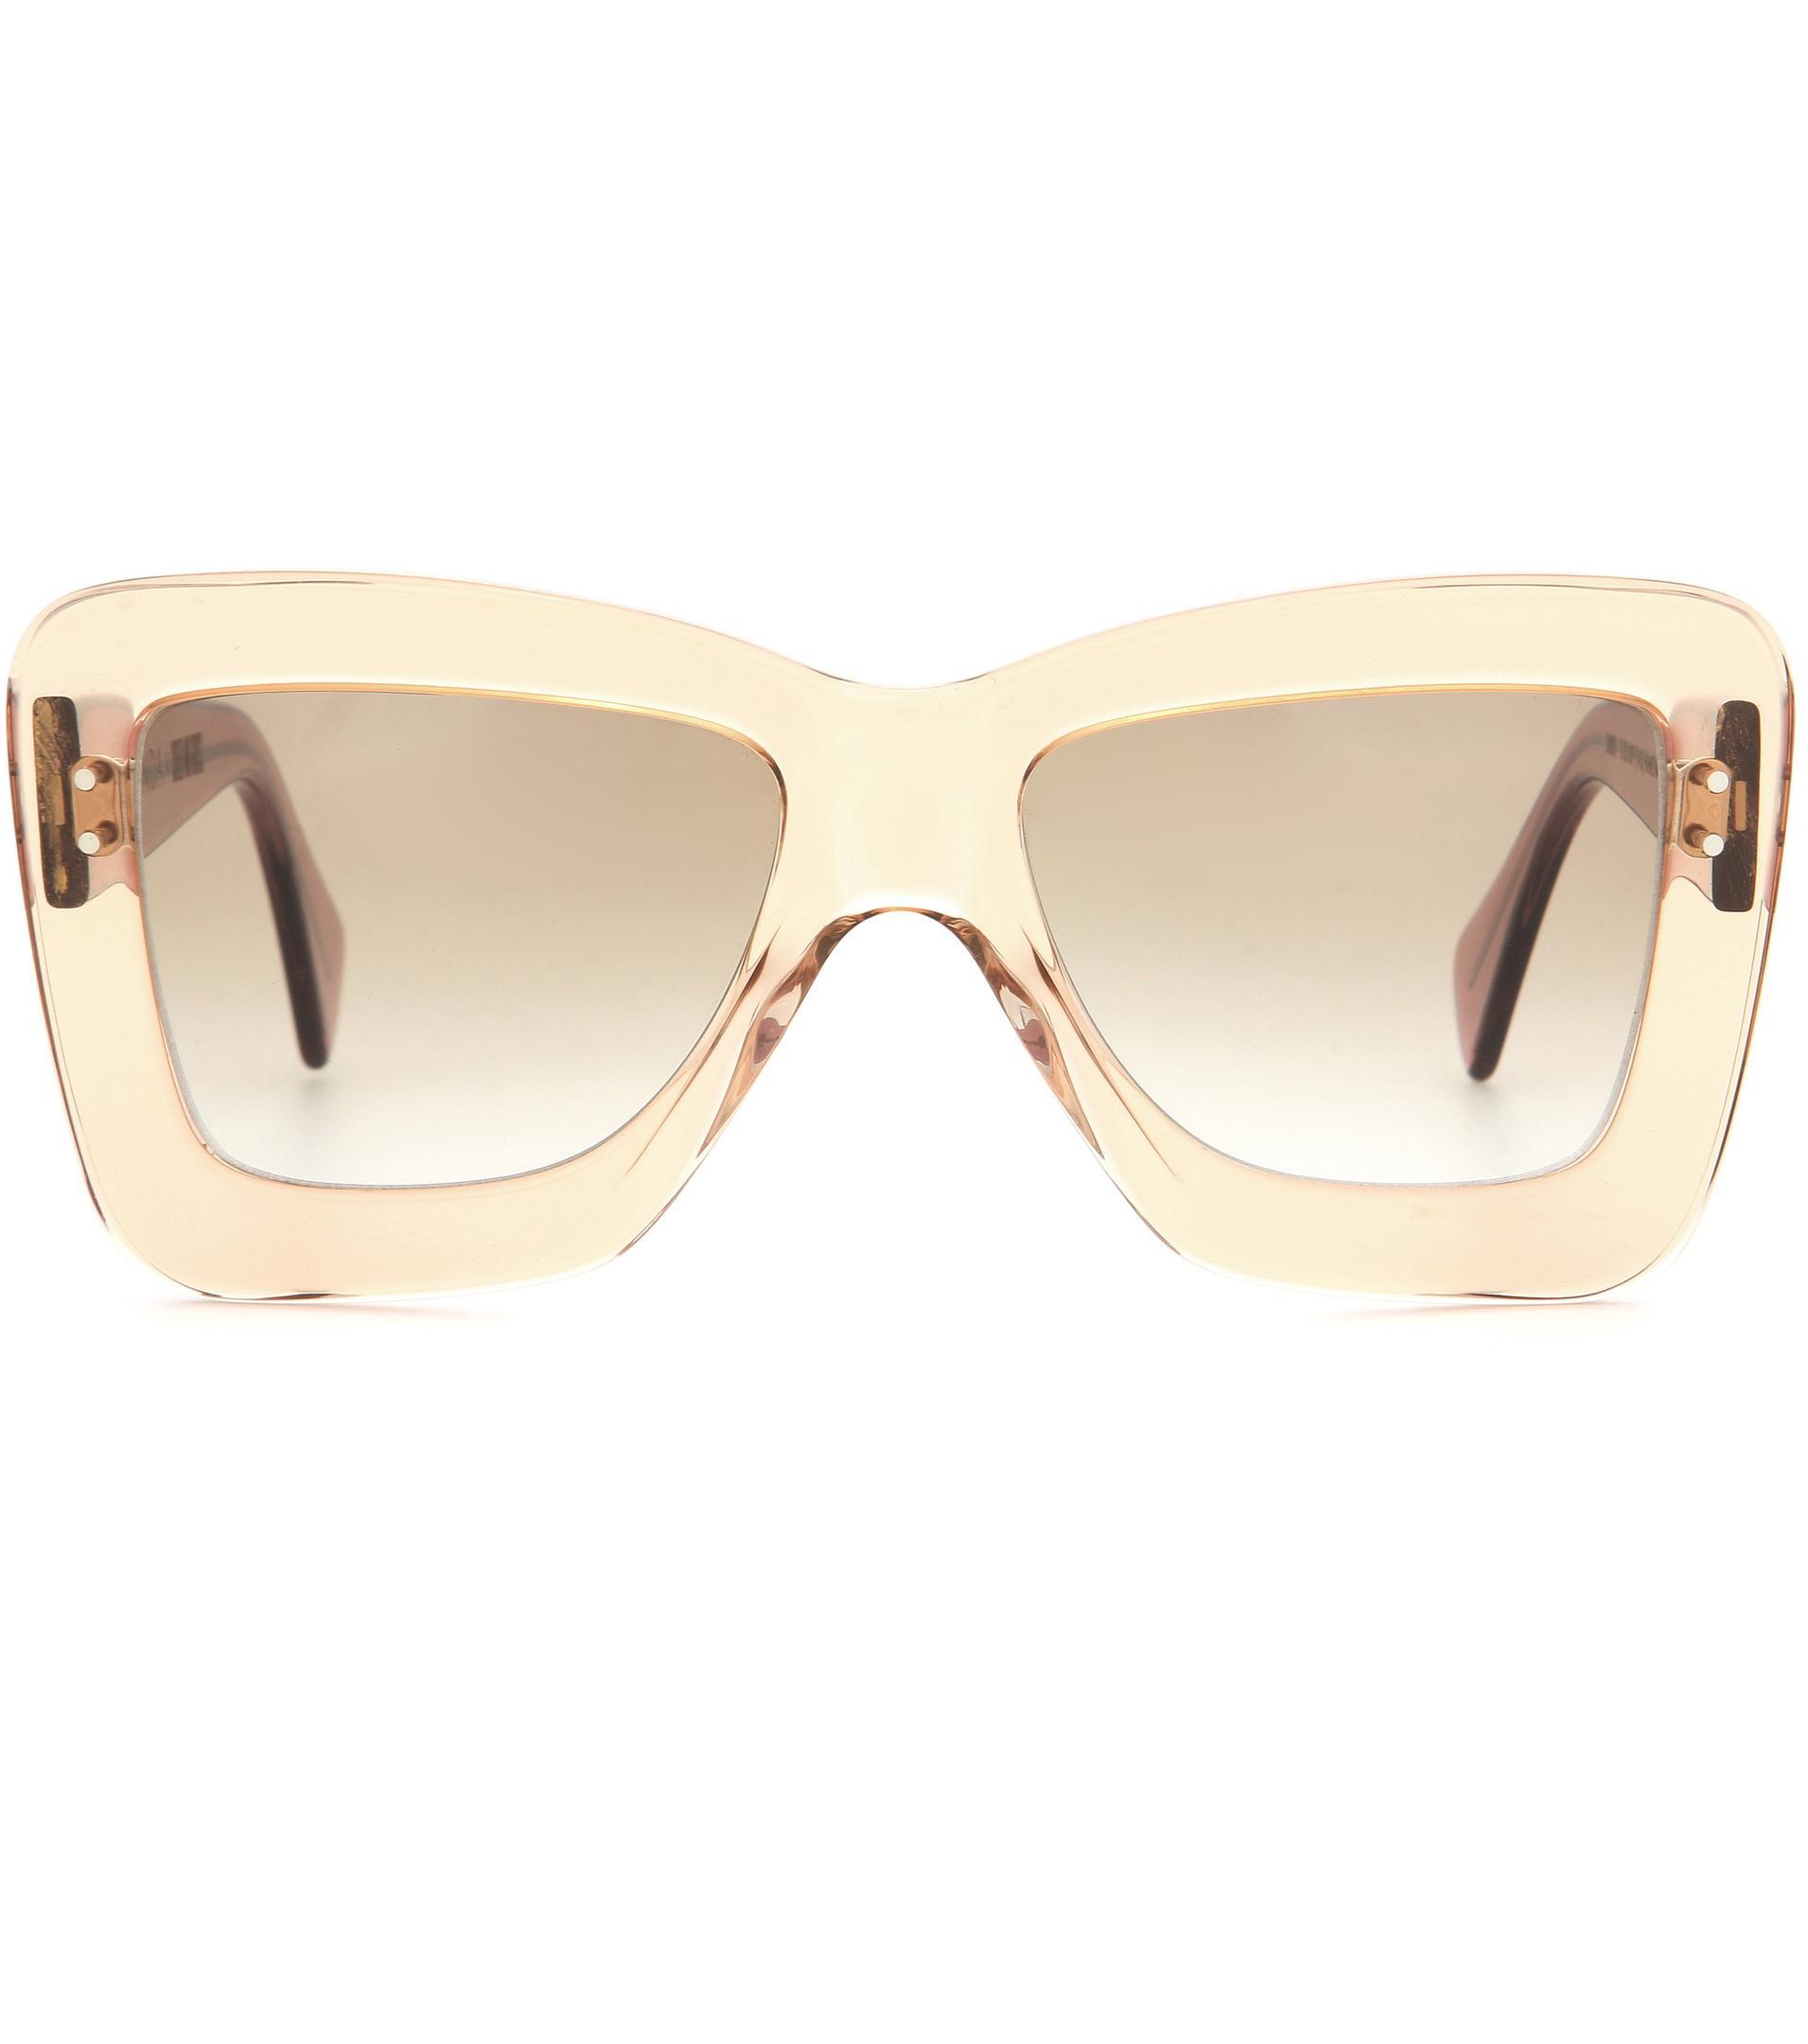 cf6df5a616 Lyst - Roksanda X Cutler And Gross Square Sunglasses in Orange